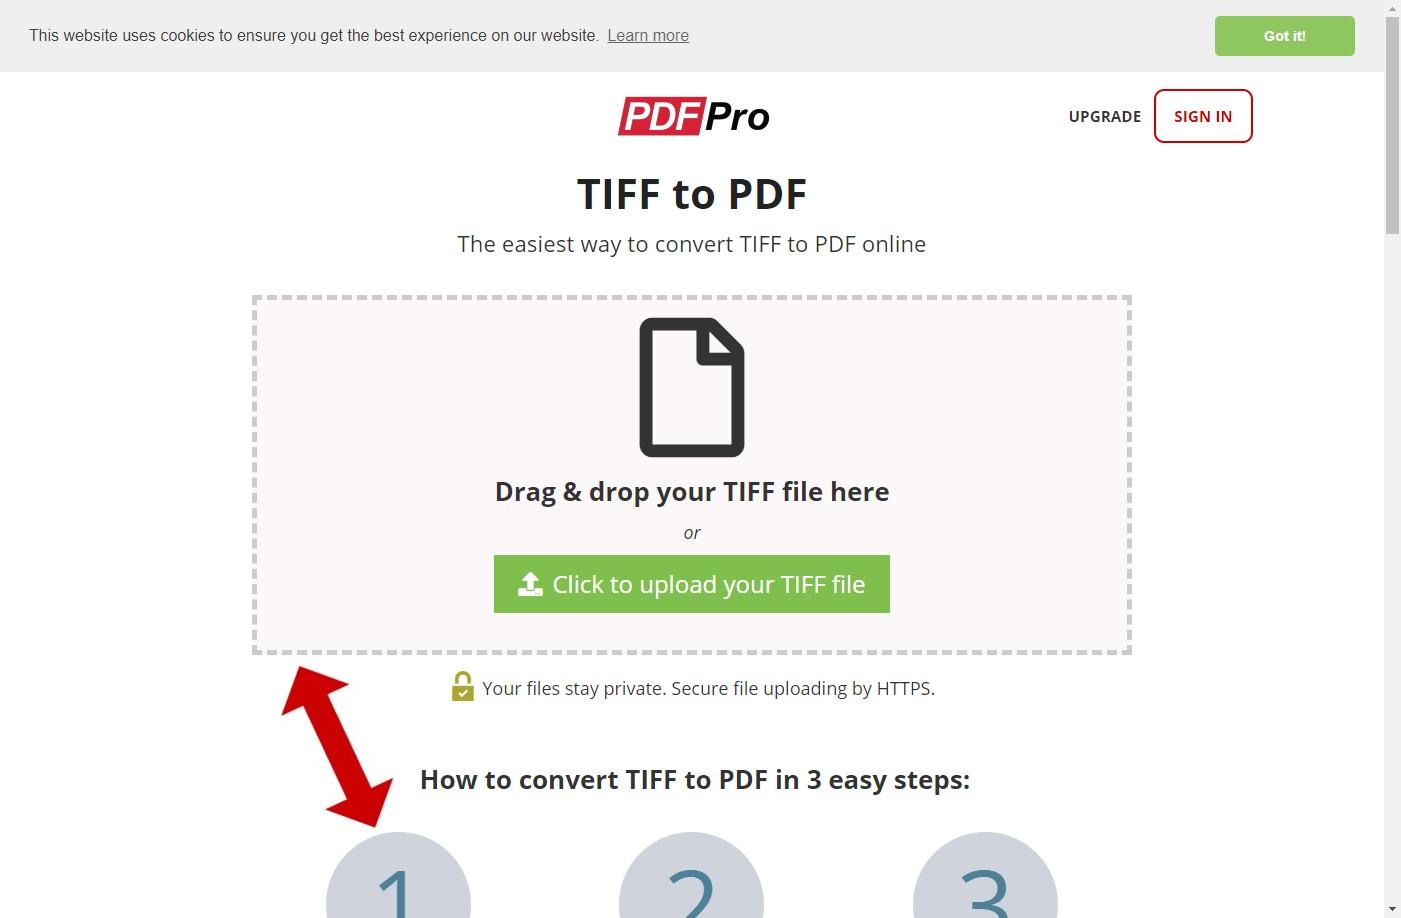 pdfpro tiff to pdf converter